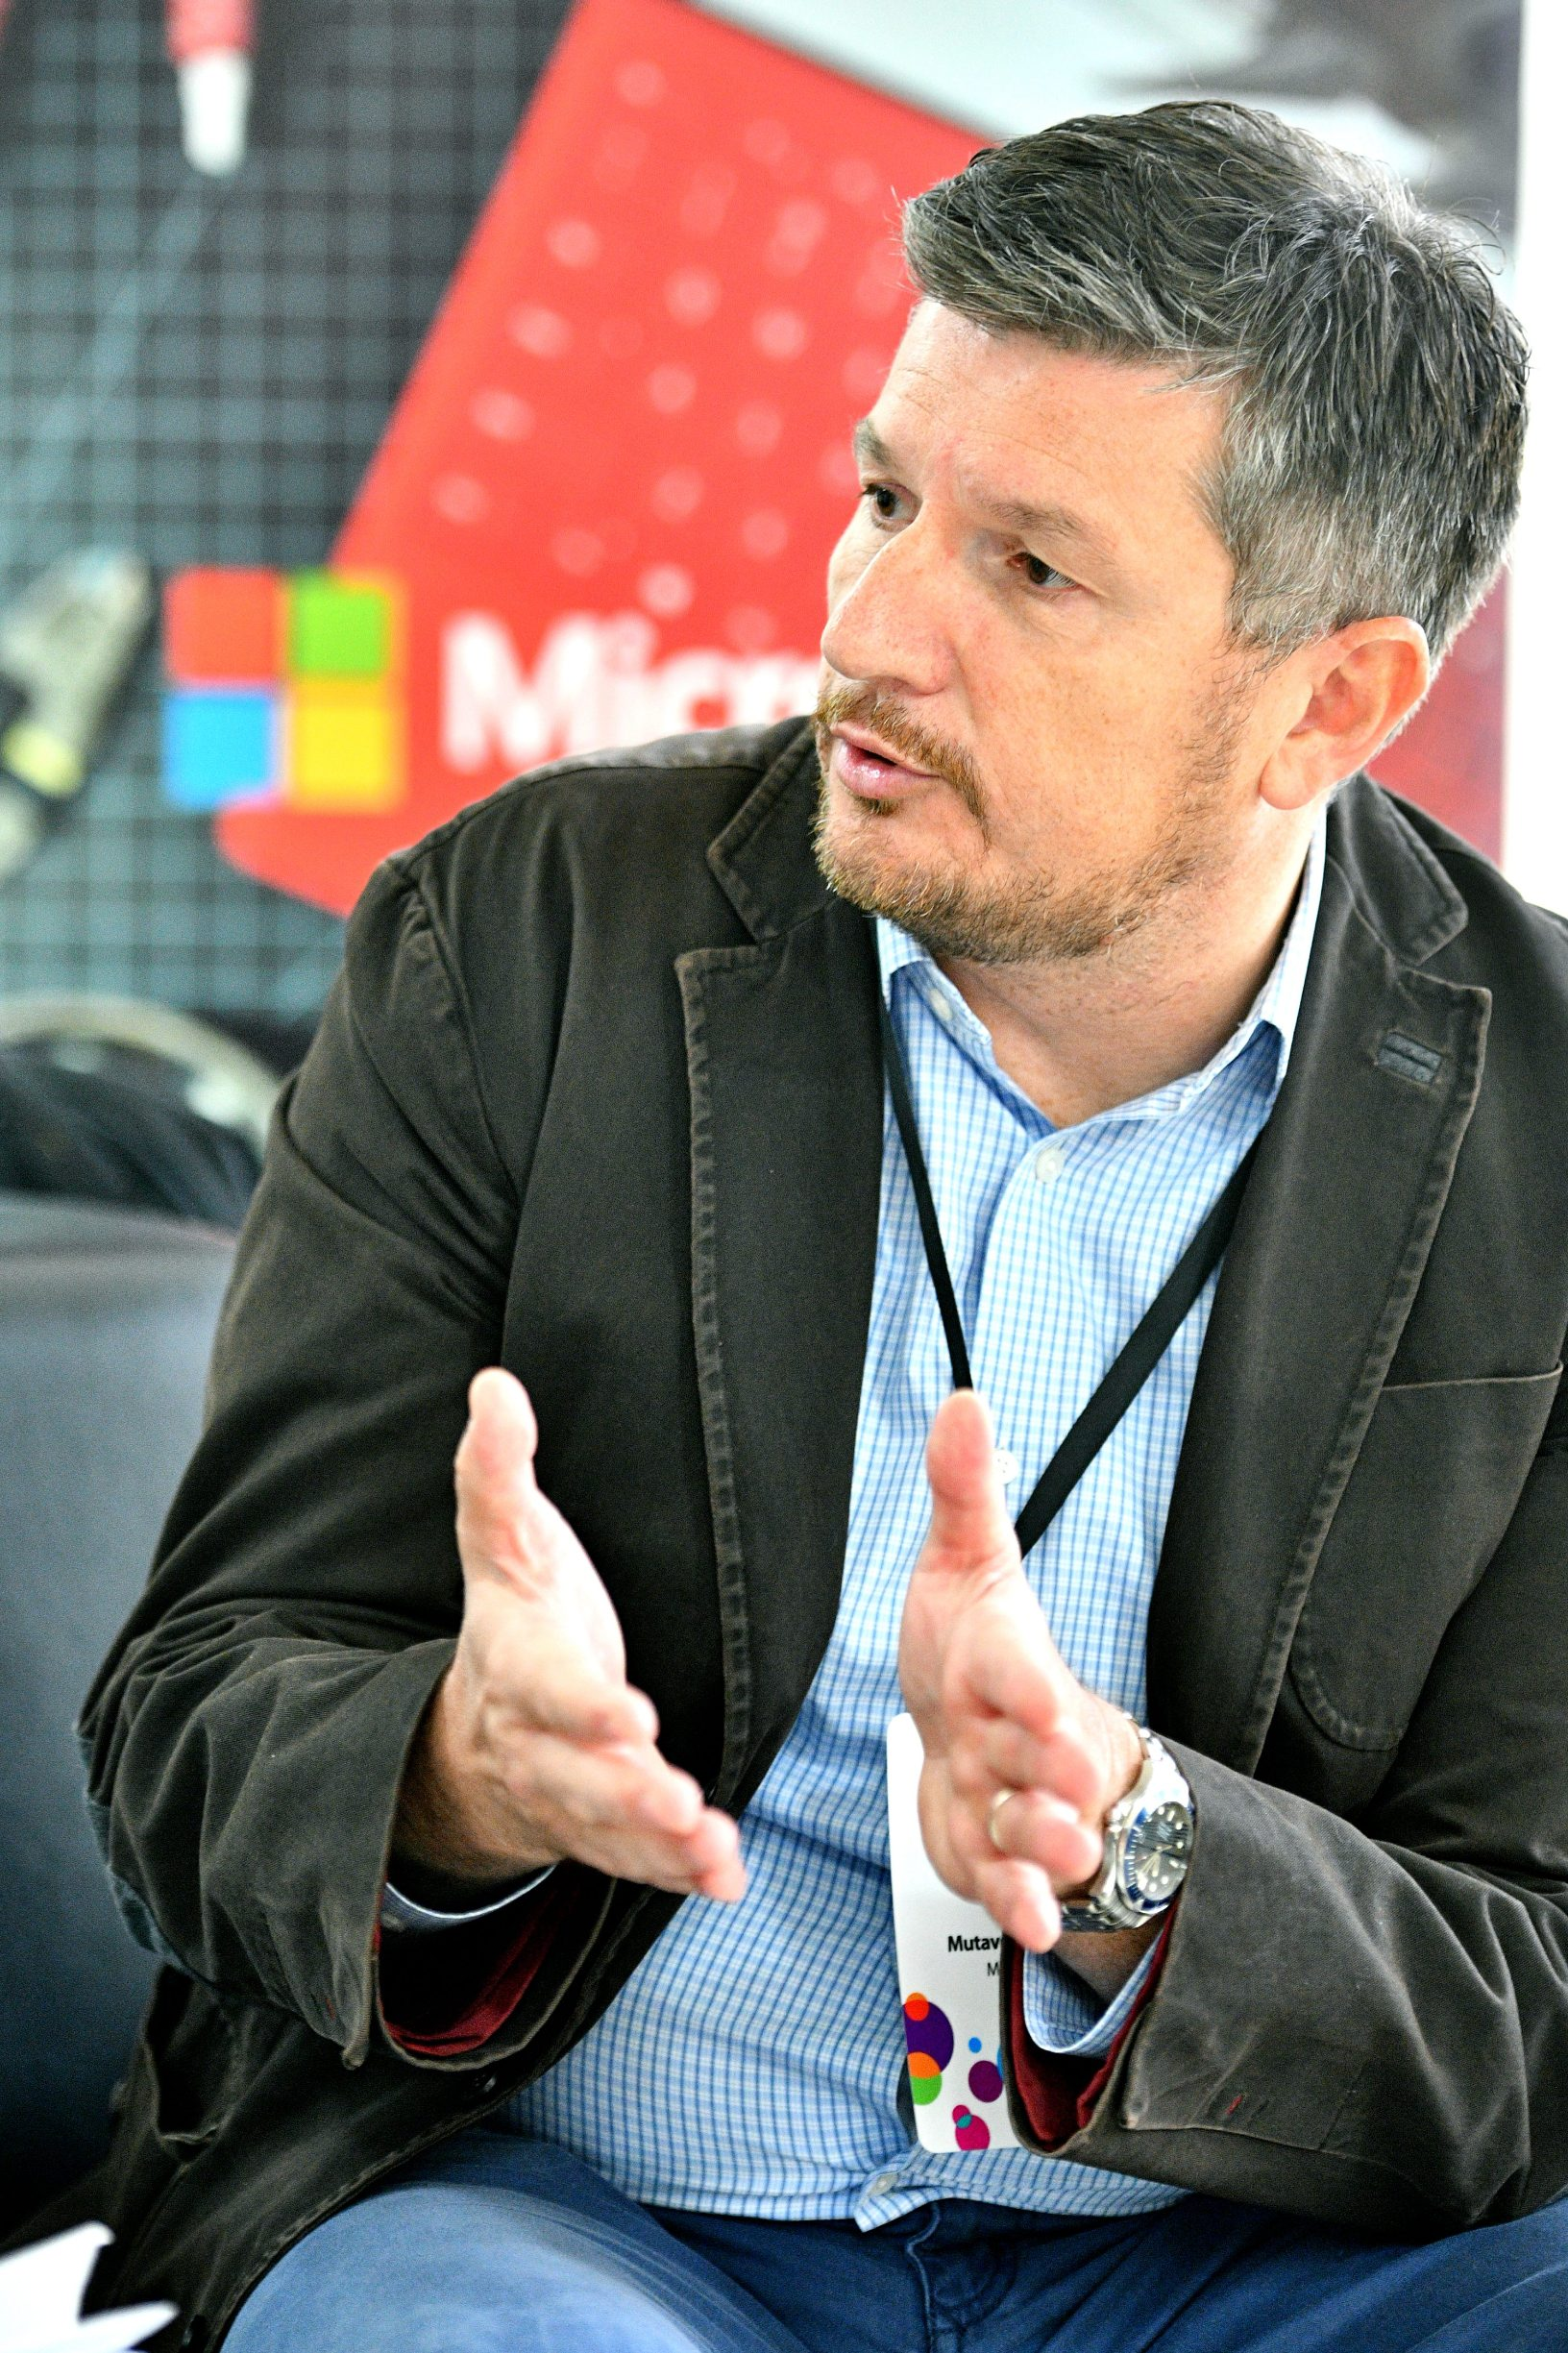 Zagreb, 111019. Kras auditorium. Intervju s Ratkom Mutavdzicem, Director, Cloud Services for Public Sector in Central Eastern Europe, voditelj Cloud usluga za javni sektor u Srednjoistcoj Europi unutar tvrtke Microsoft. Foto: Srdjan Vrancic / CROPIX